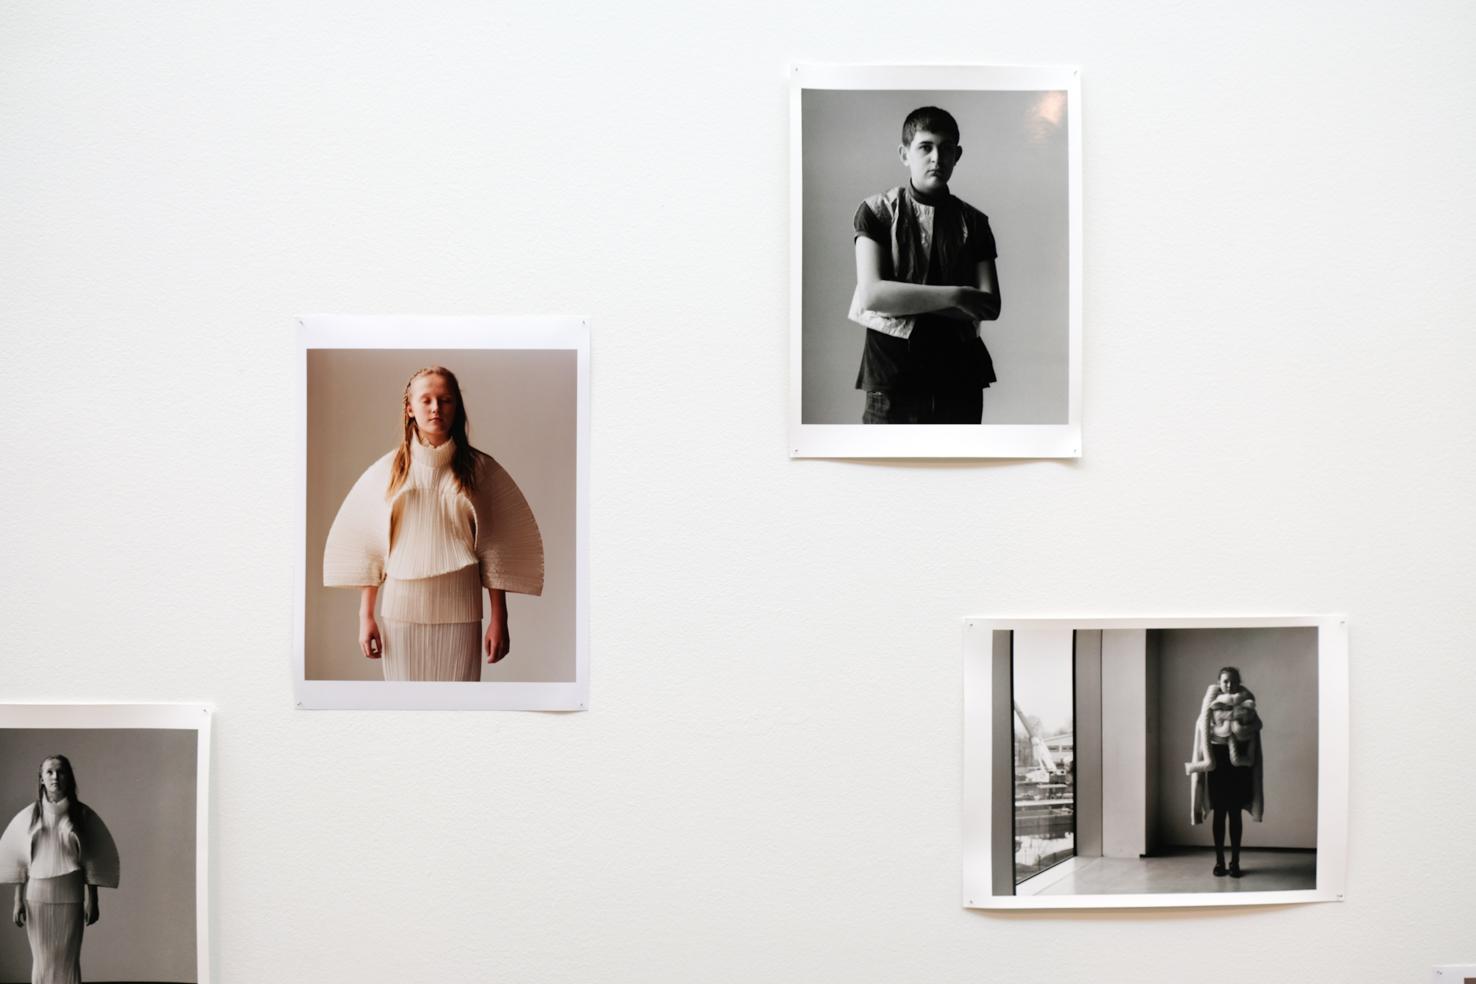 32 Photographs by Jamie Hawkesworth